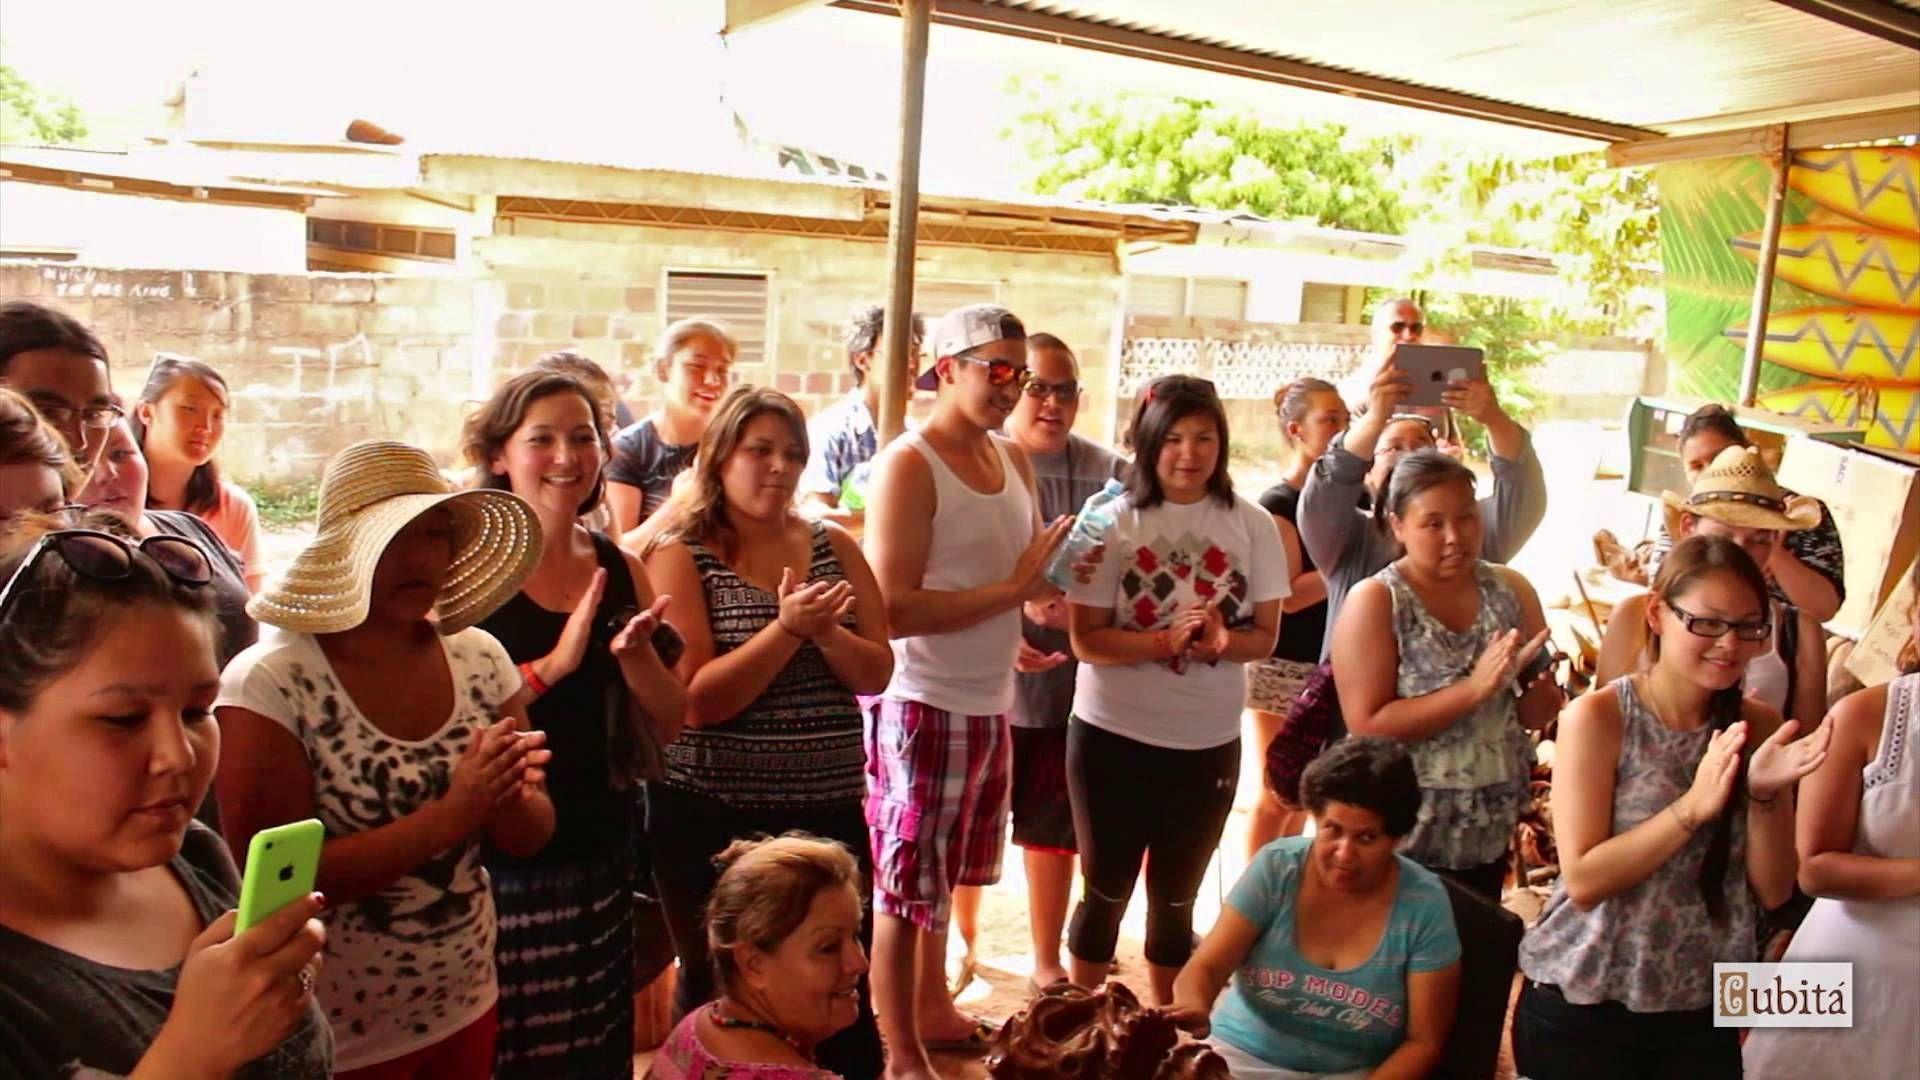 Azuero's Folklore | El Folclor de Azuero #Panama #azuero #folklore #cubitatours